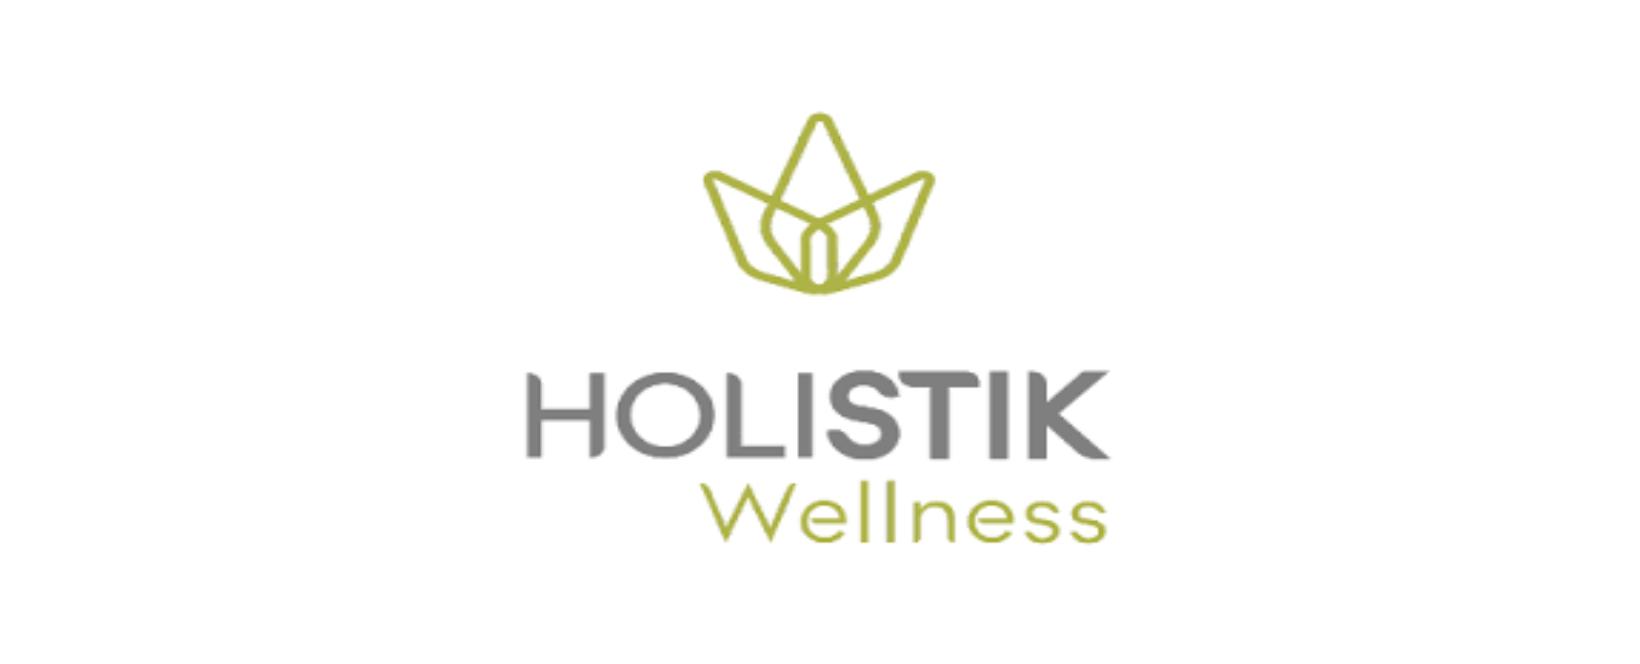 HOLISTIK Wellness Discount Code 2021